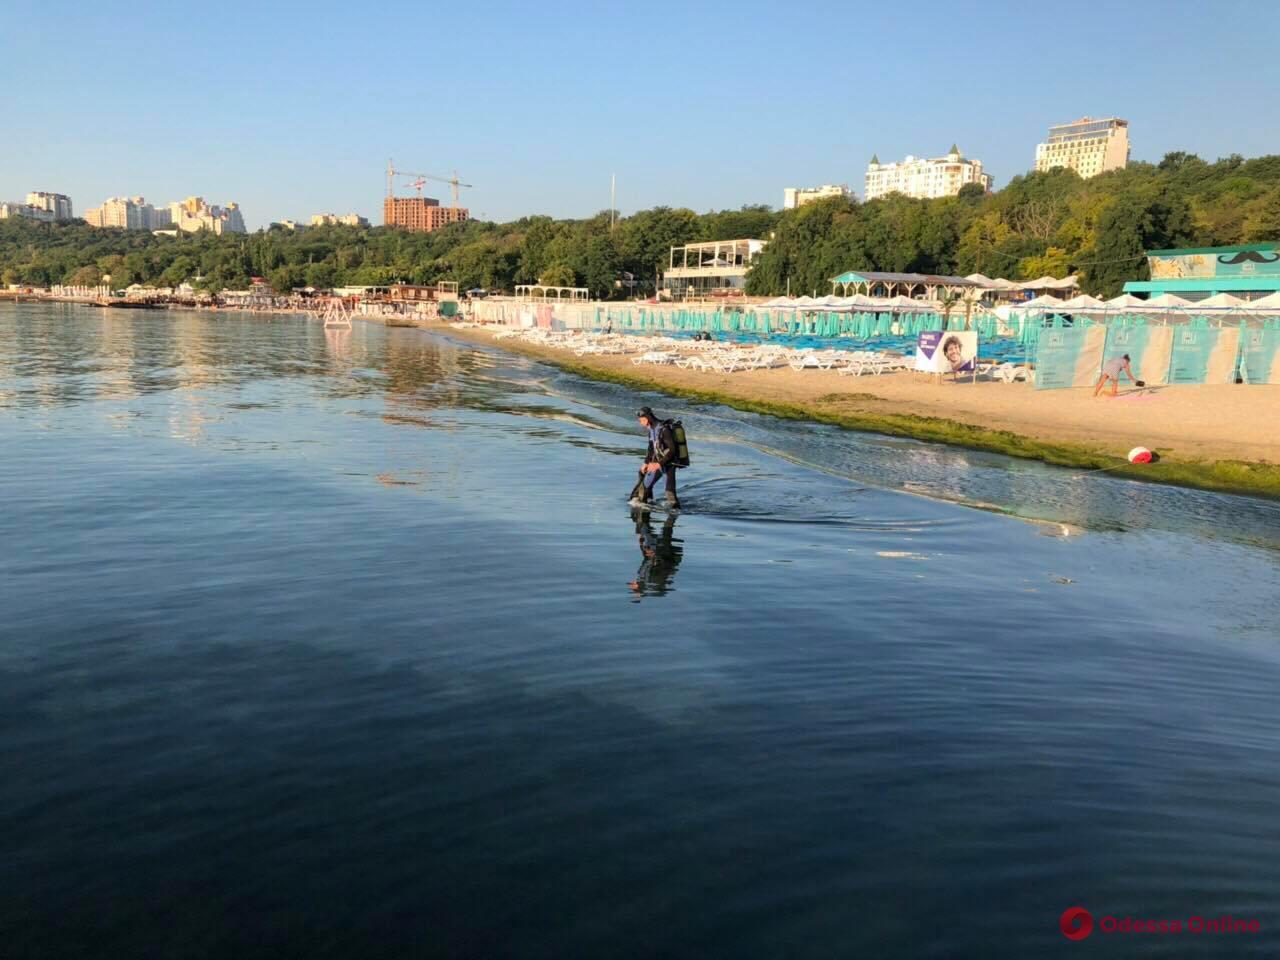 На пляже «Отрада» утонул мужчина